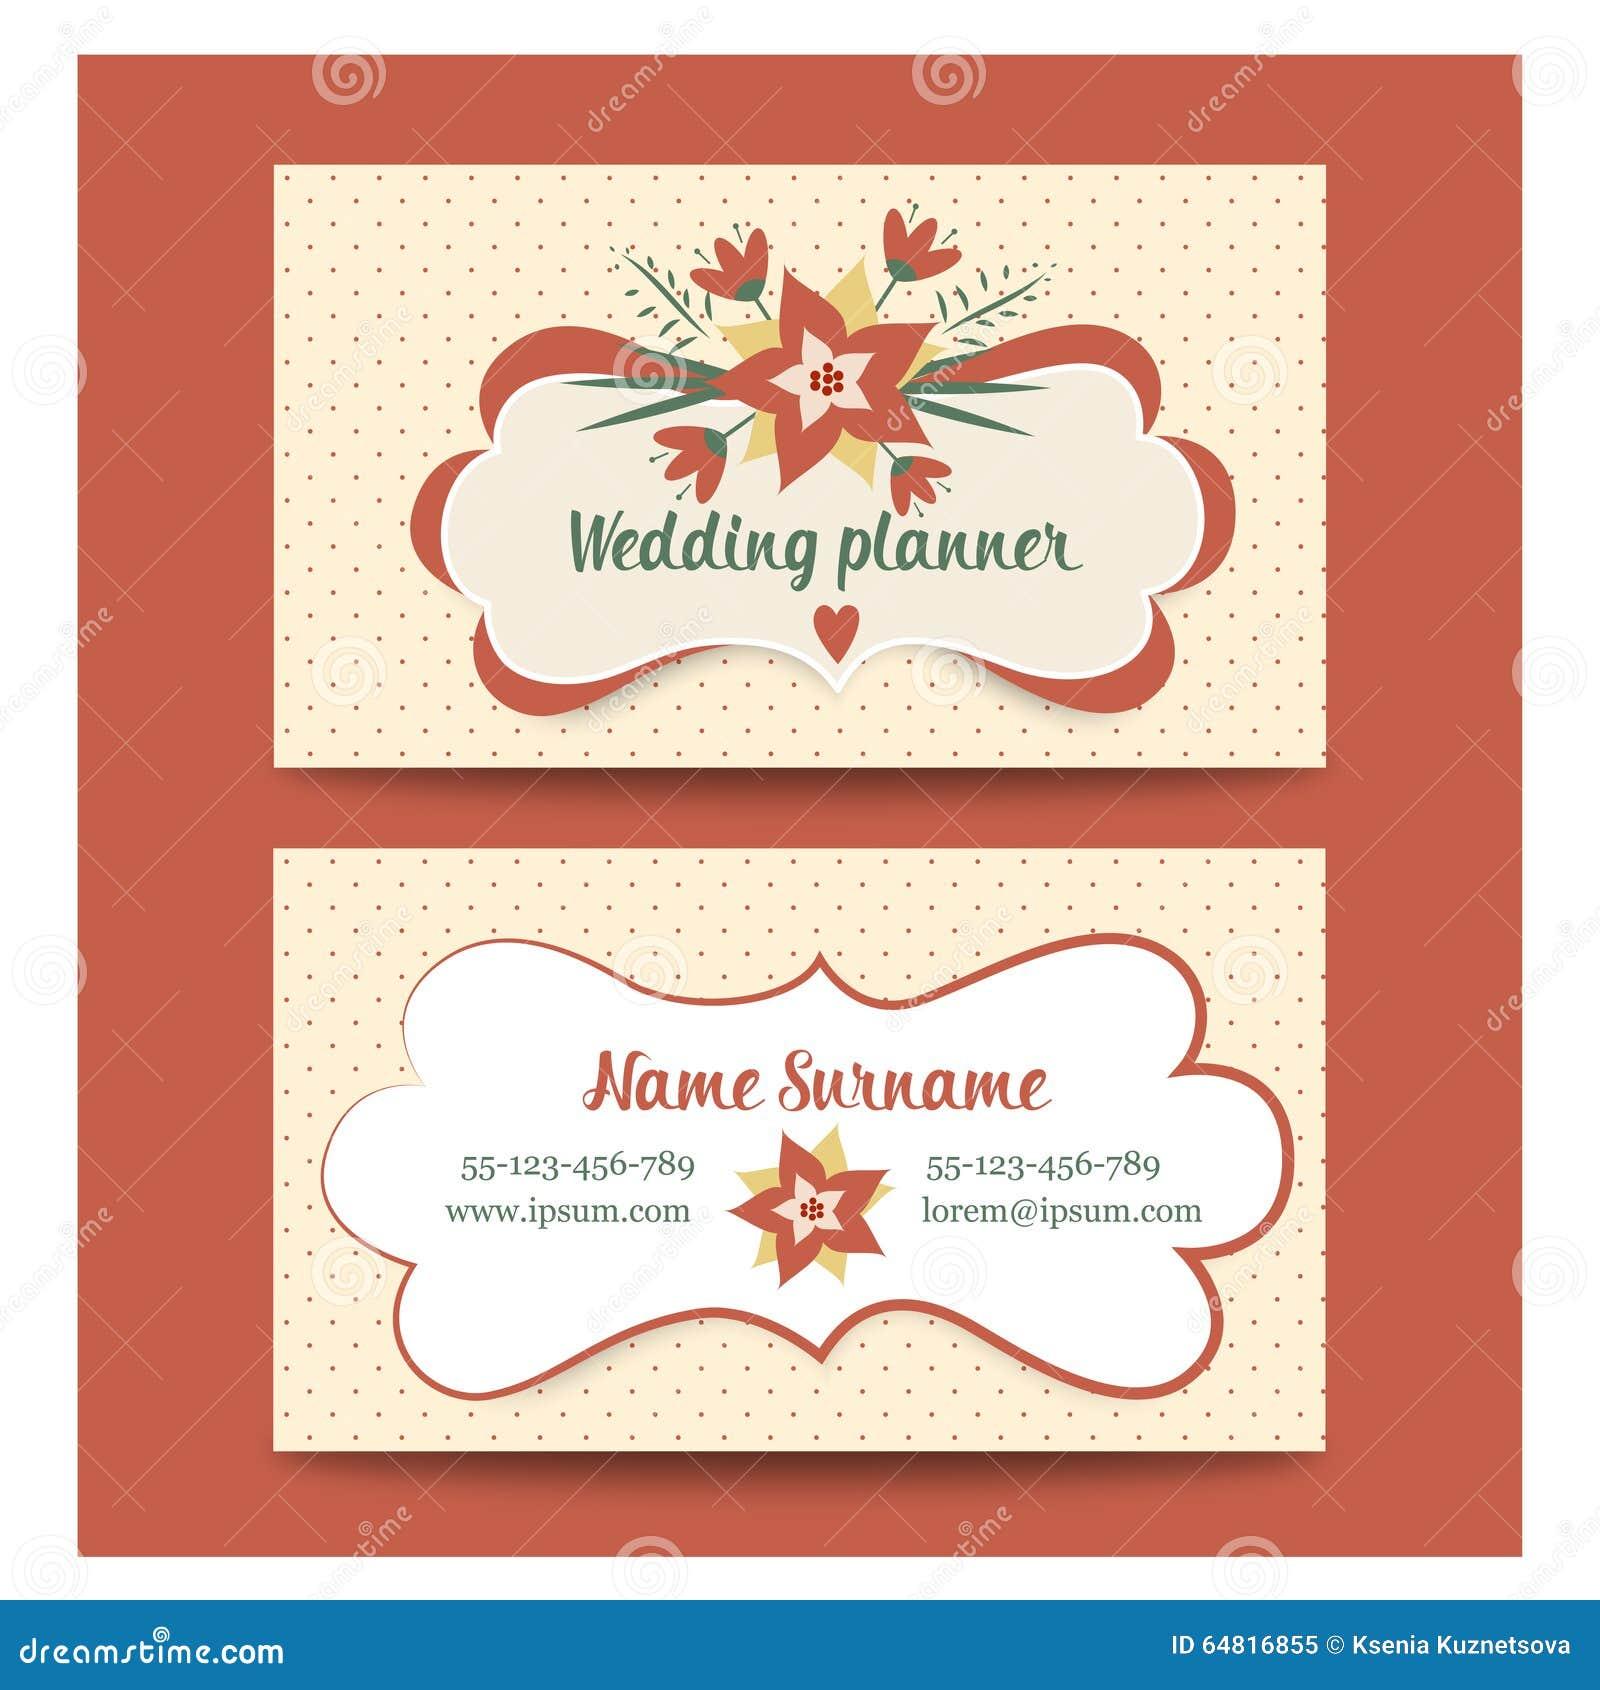 Wedding business card template mandegarfo wedding business card template cheaphphosting Gallery